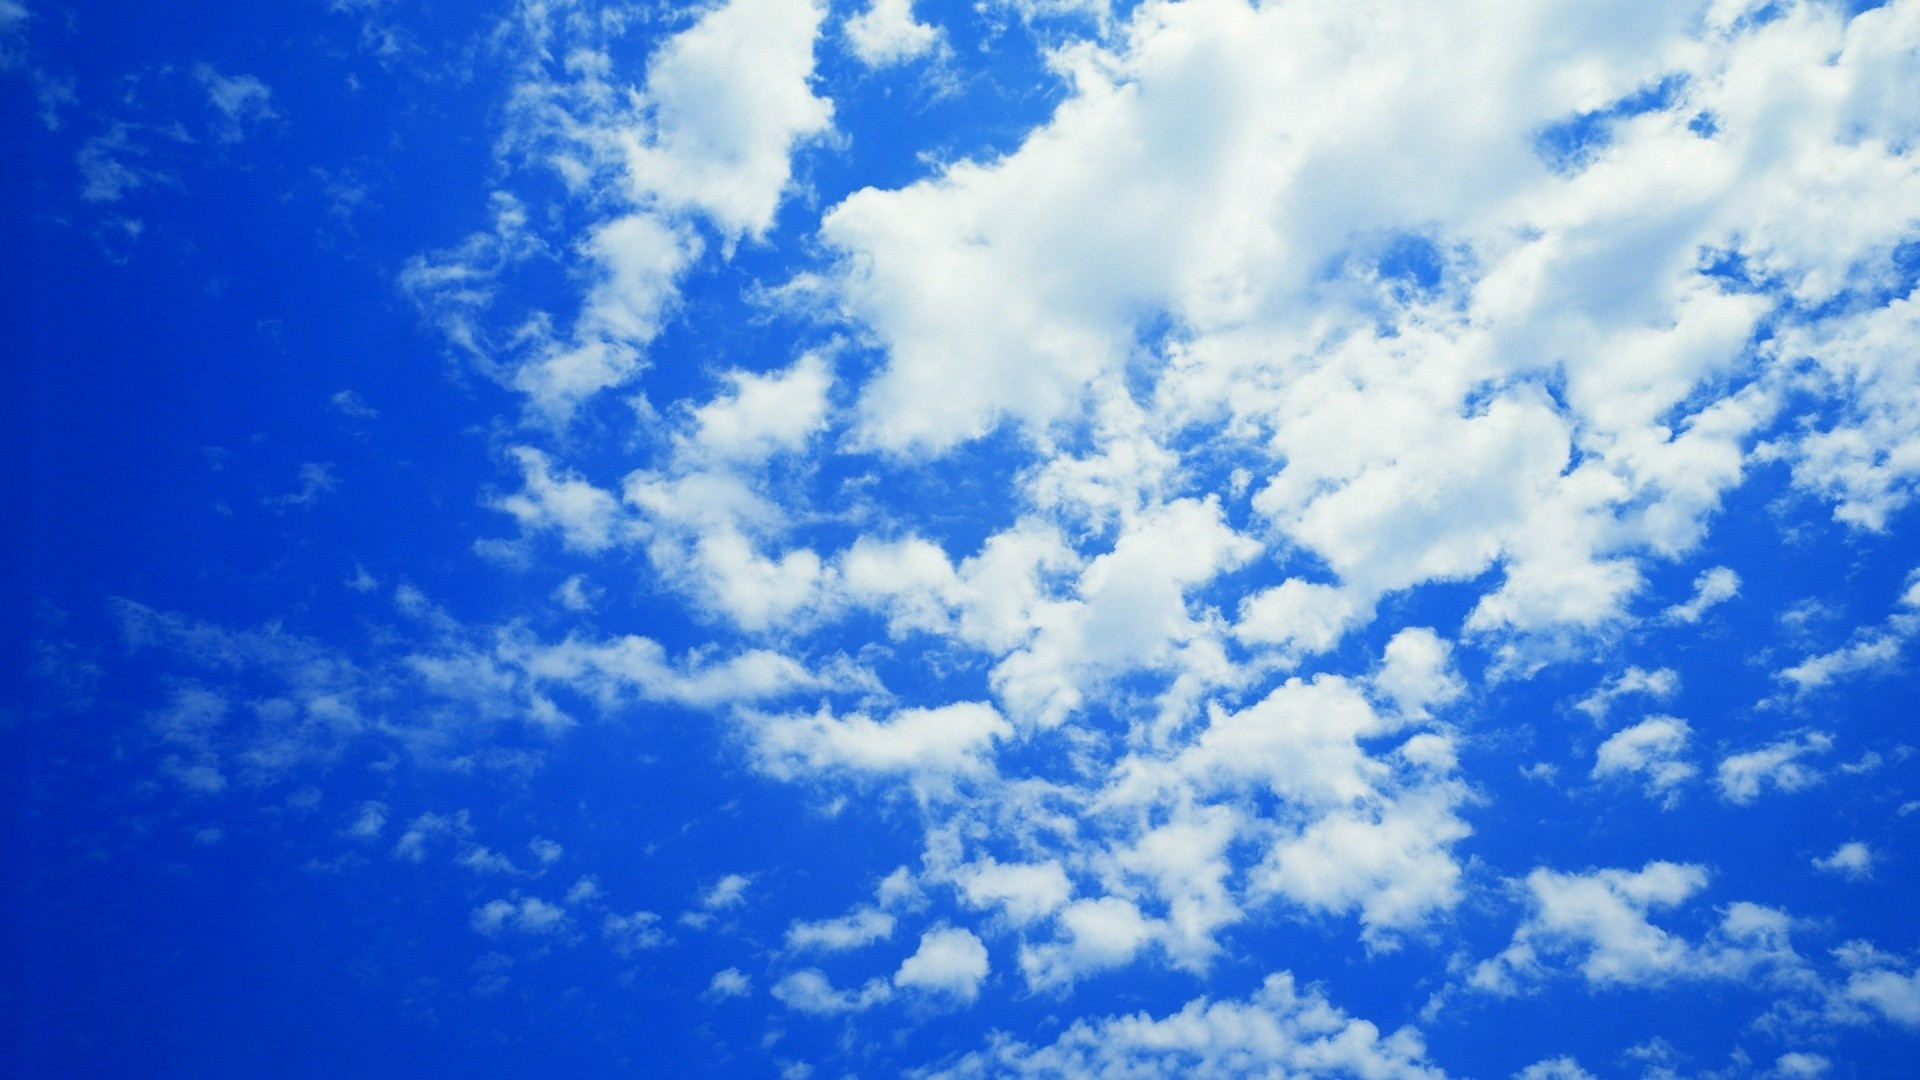 Blue Cloud Wallpaper